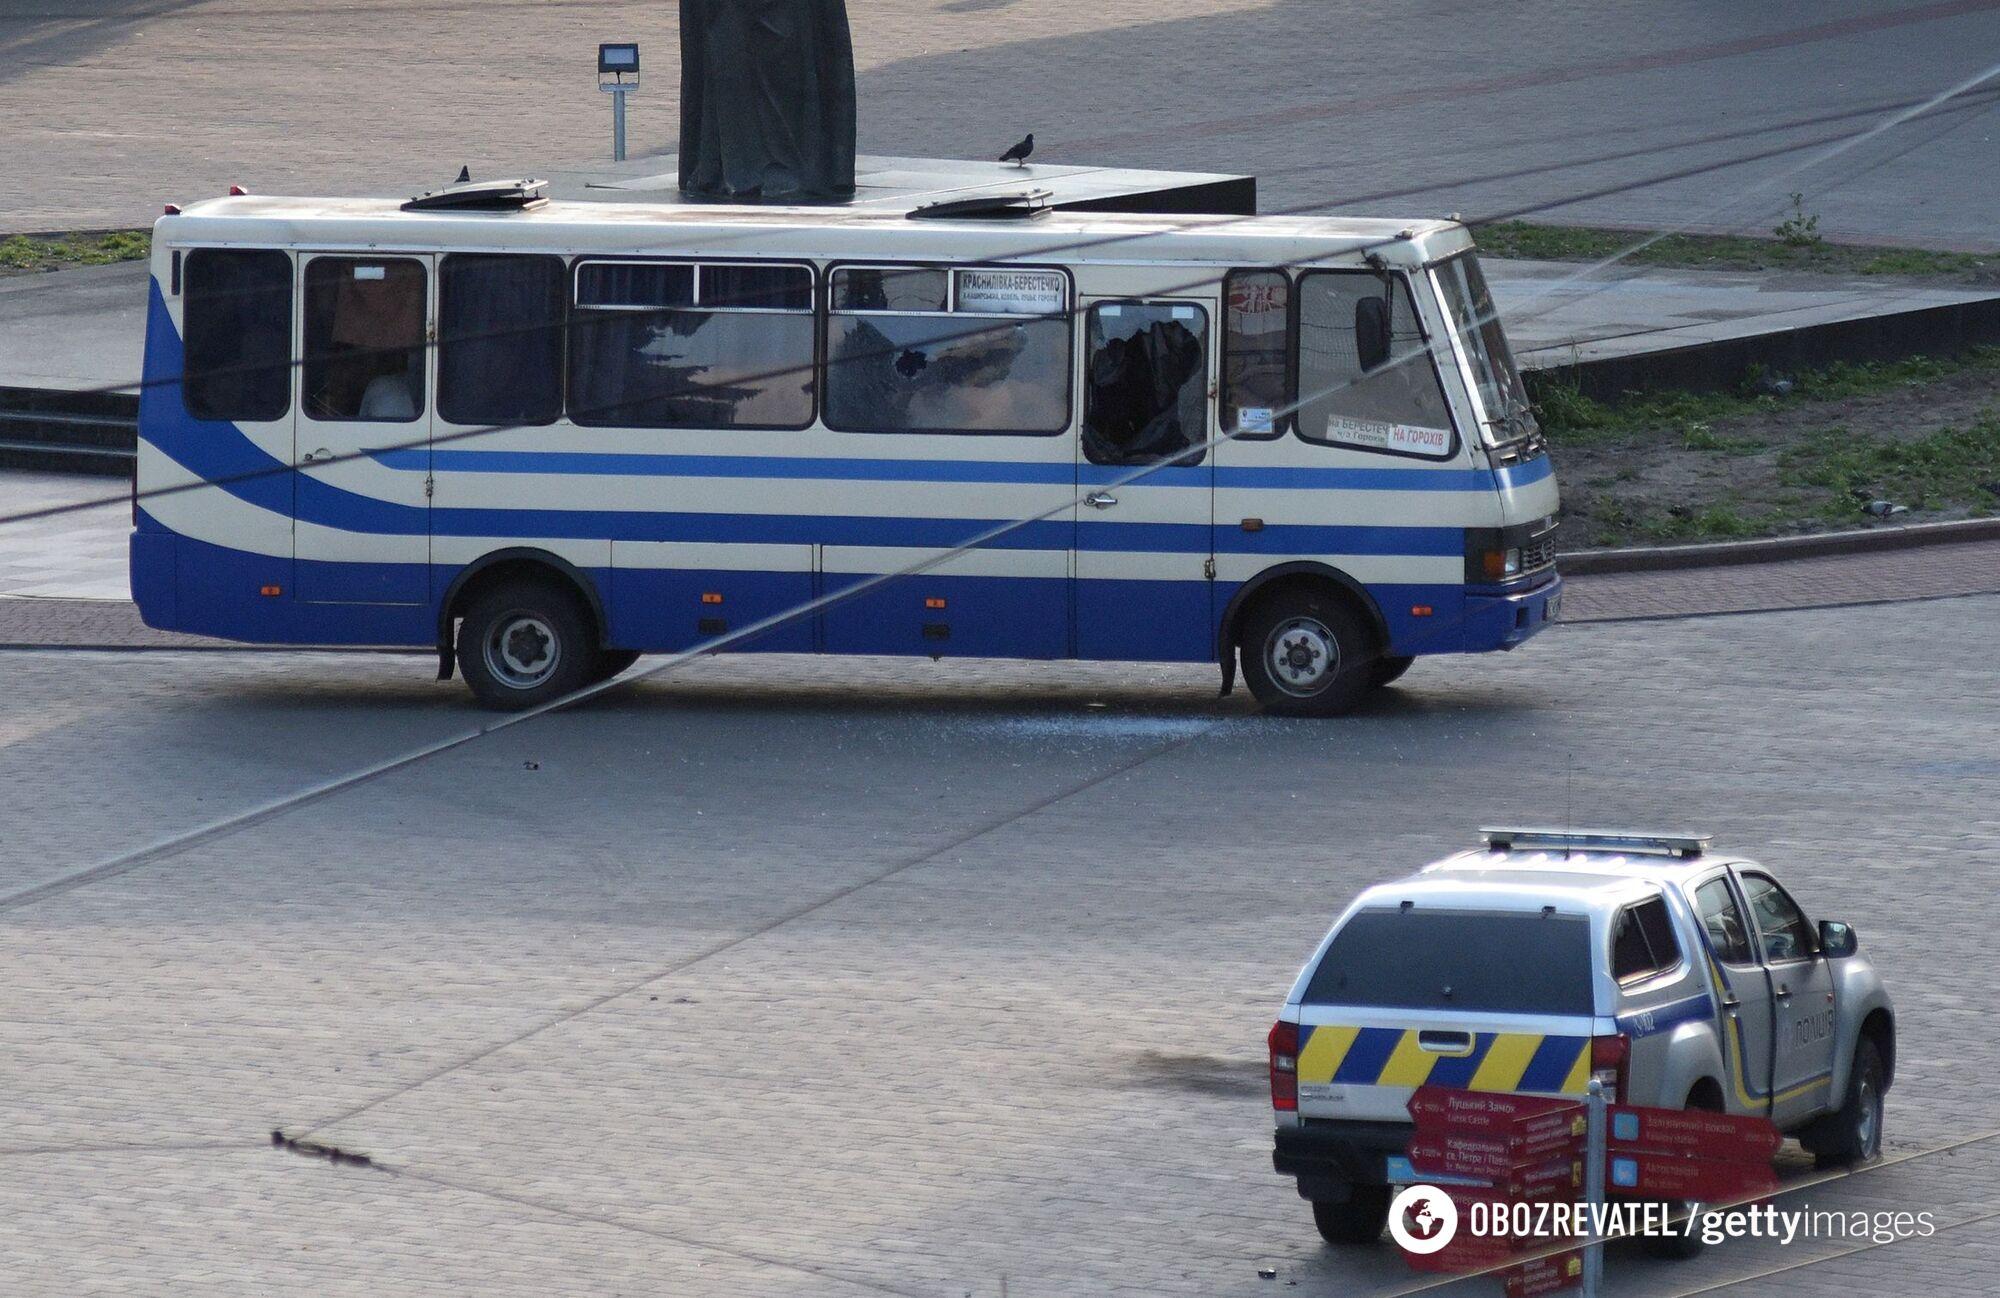 Заручники провели в автобусі близько 12 годин